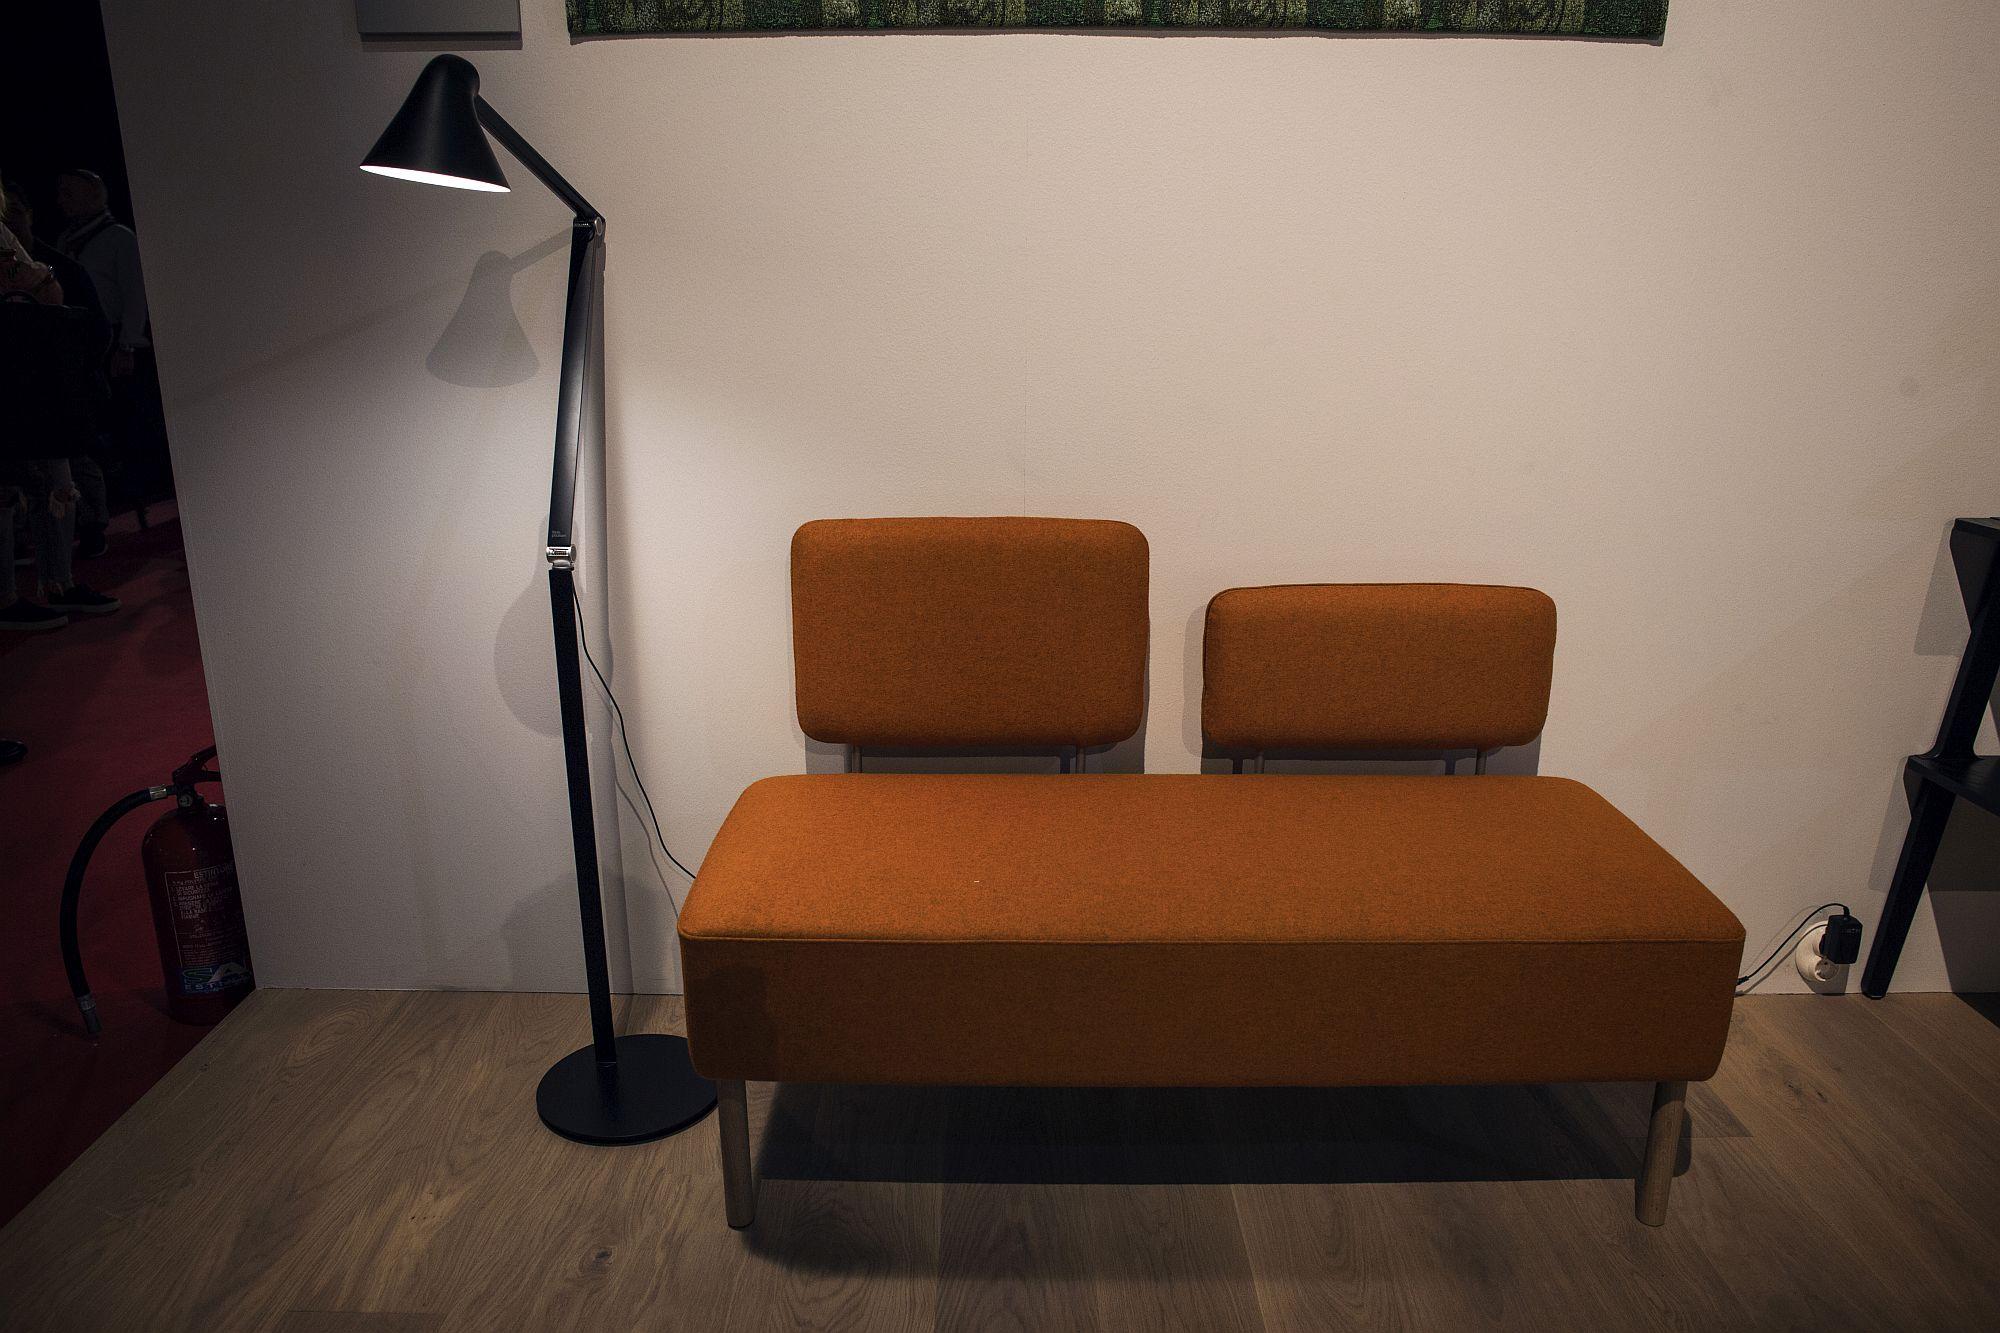 Exquisite-floor-lamp-in-black-from-Swedese